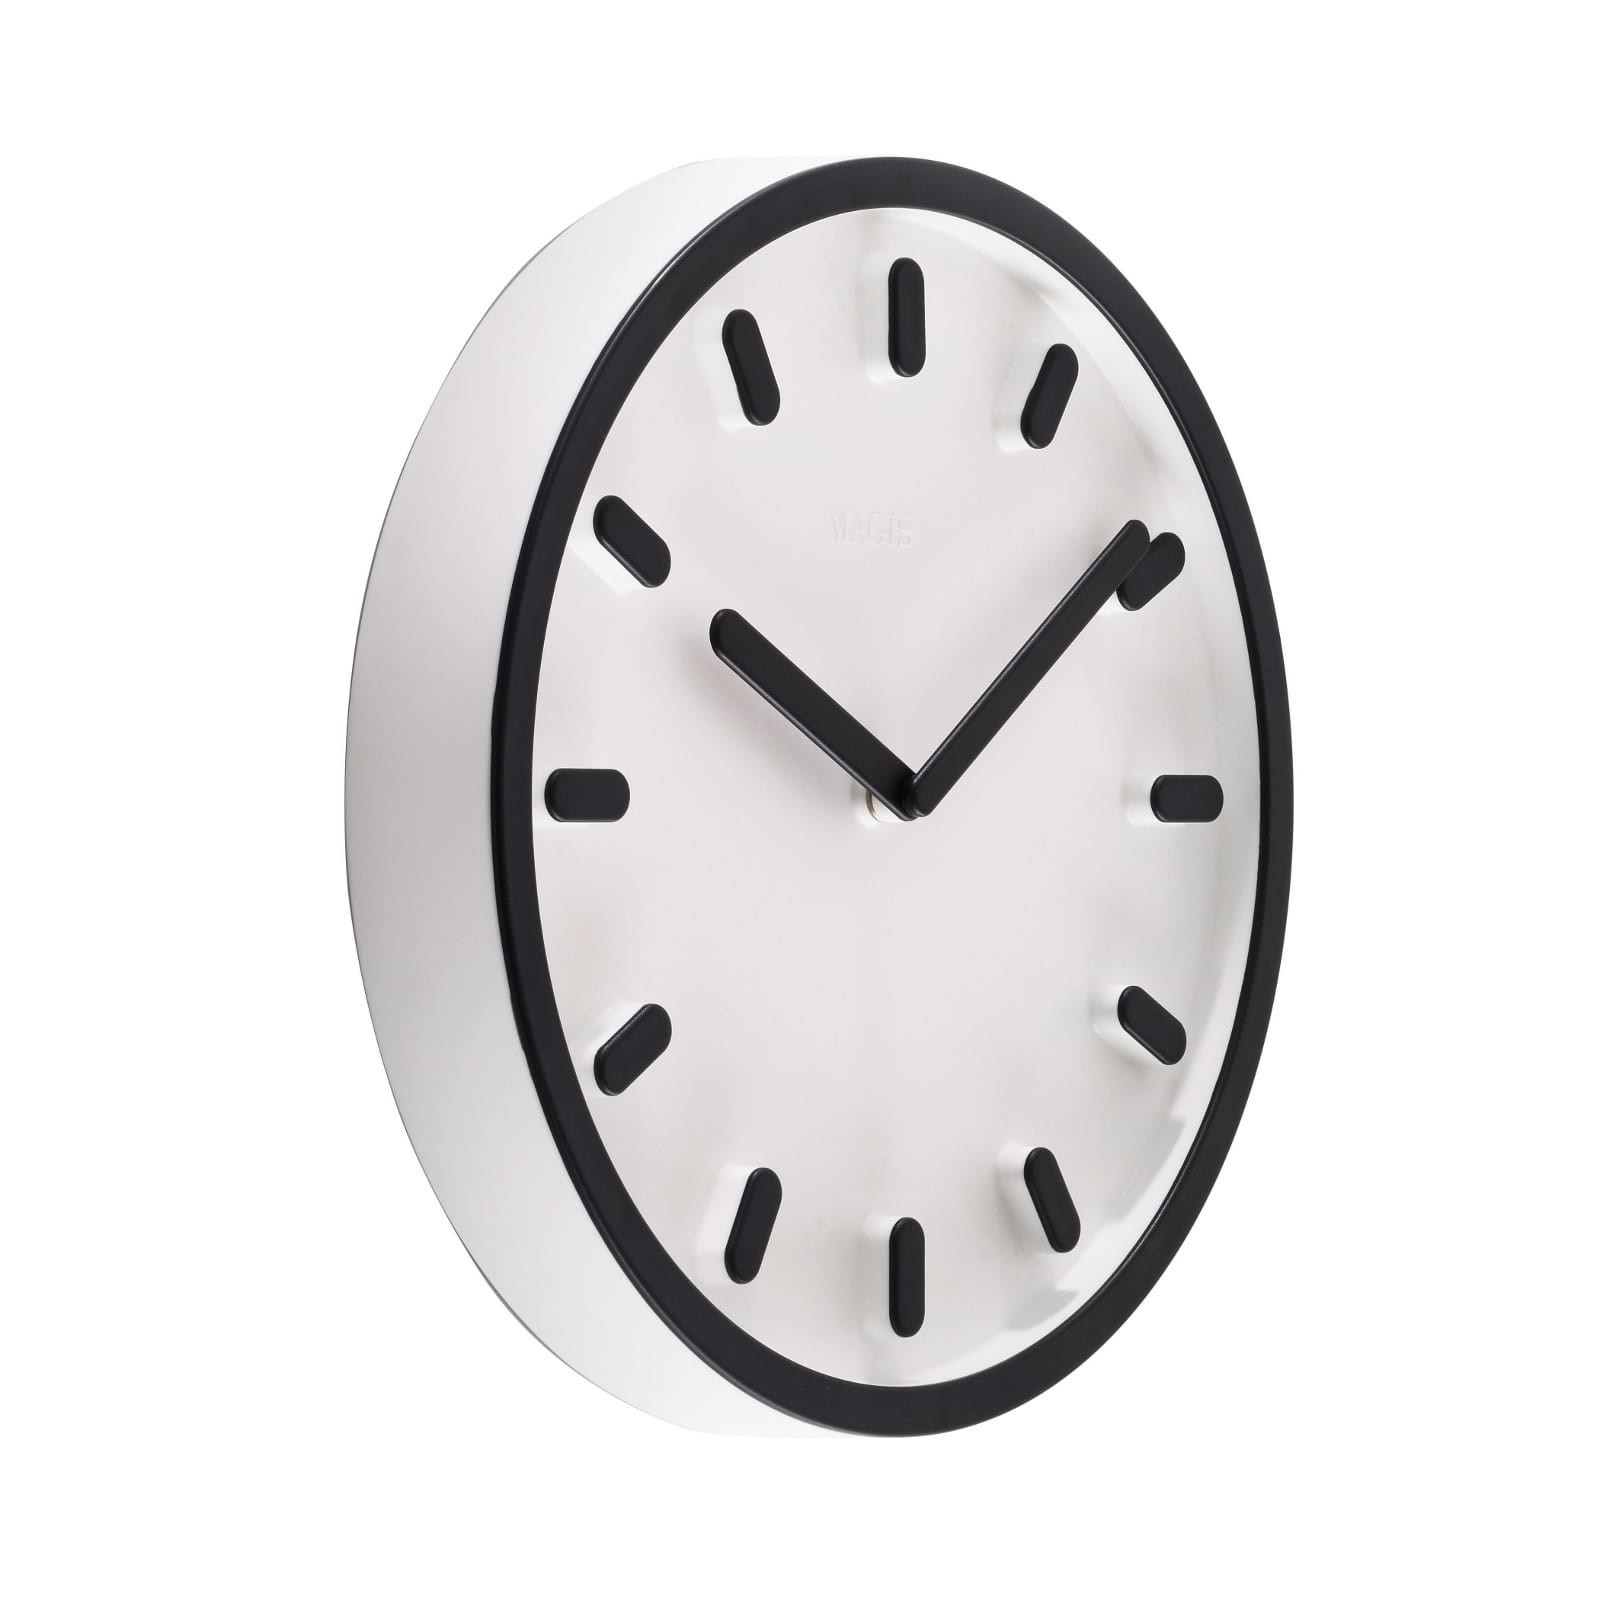 Tempo Wall Clock (Black) - Magis